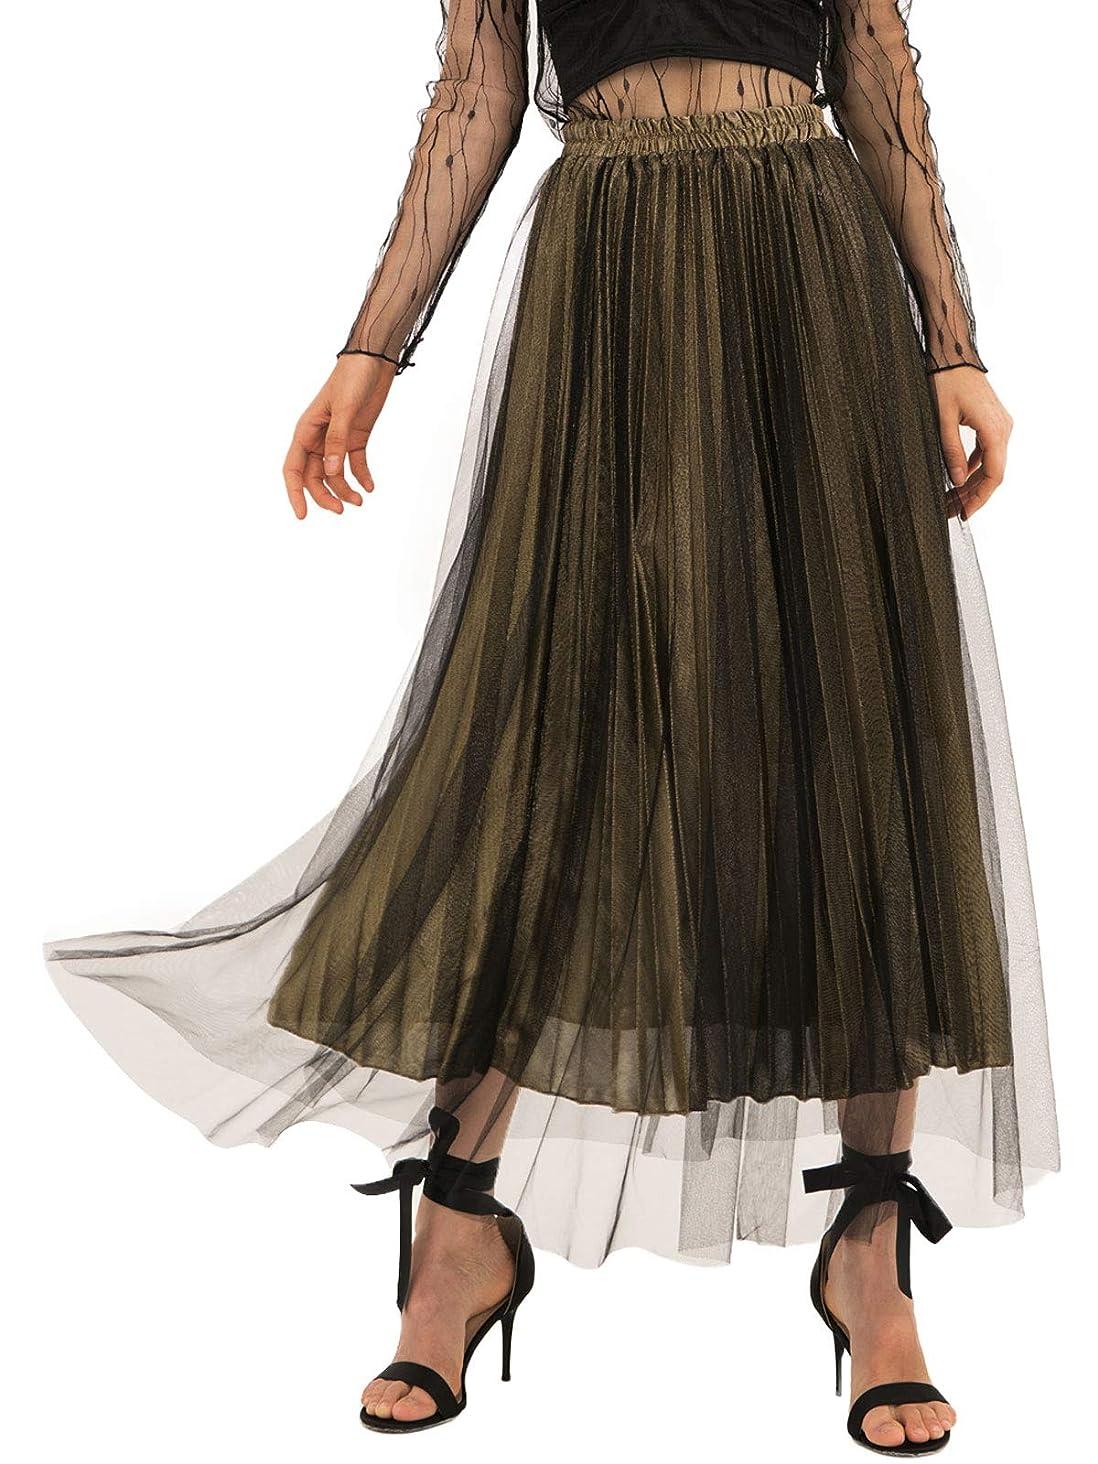 Amormio ?? Women's Glittery Gold/Silver High-Waist Metallic Accordion Pleated Formal Party Maxi Skirt